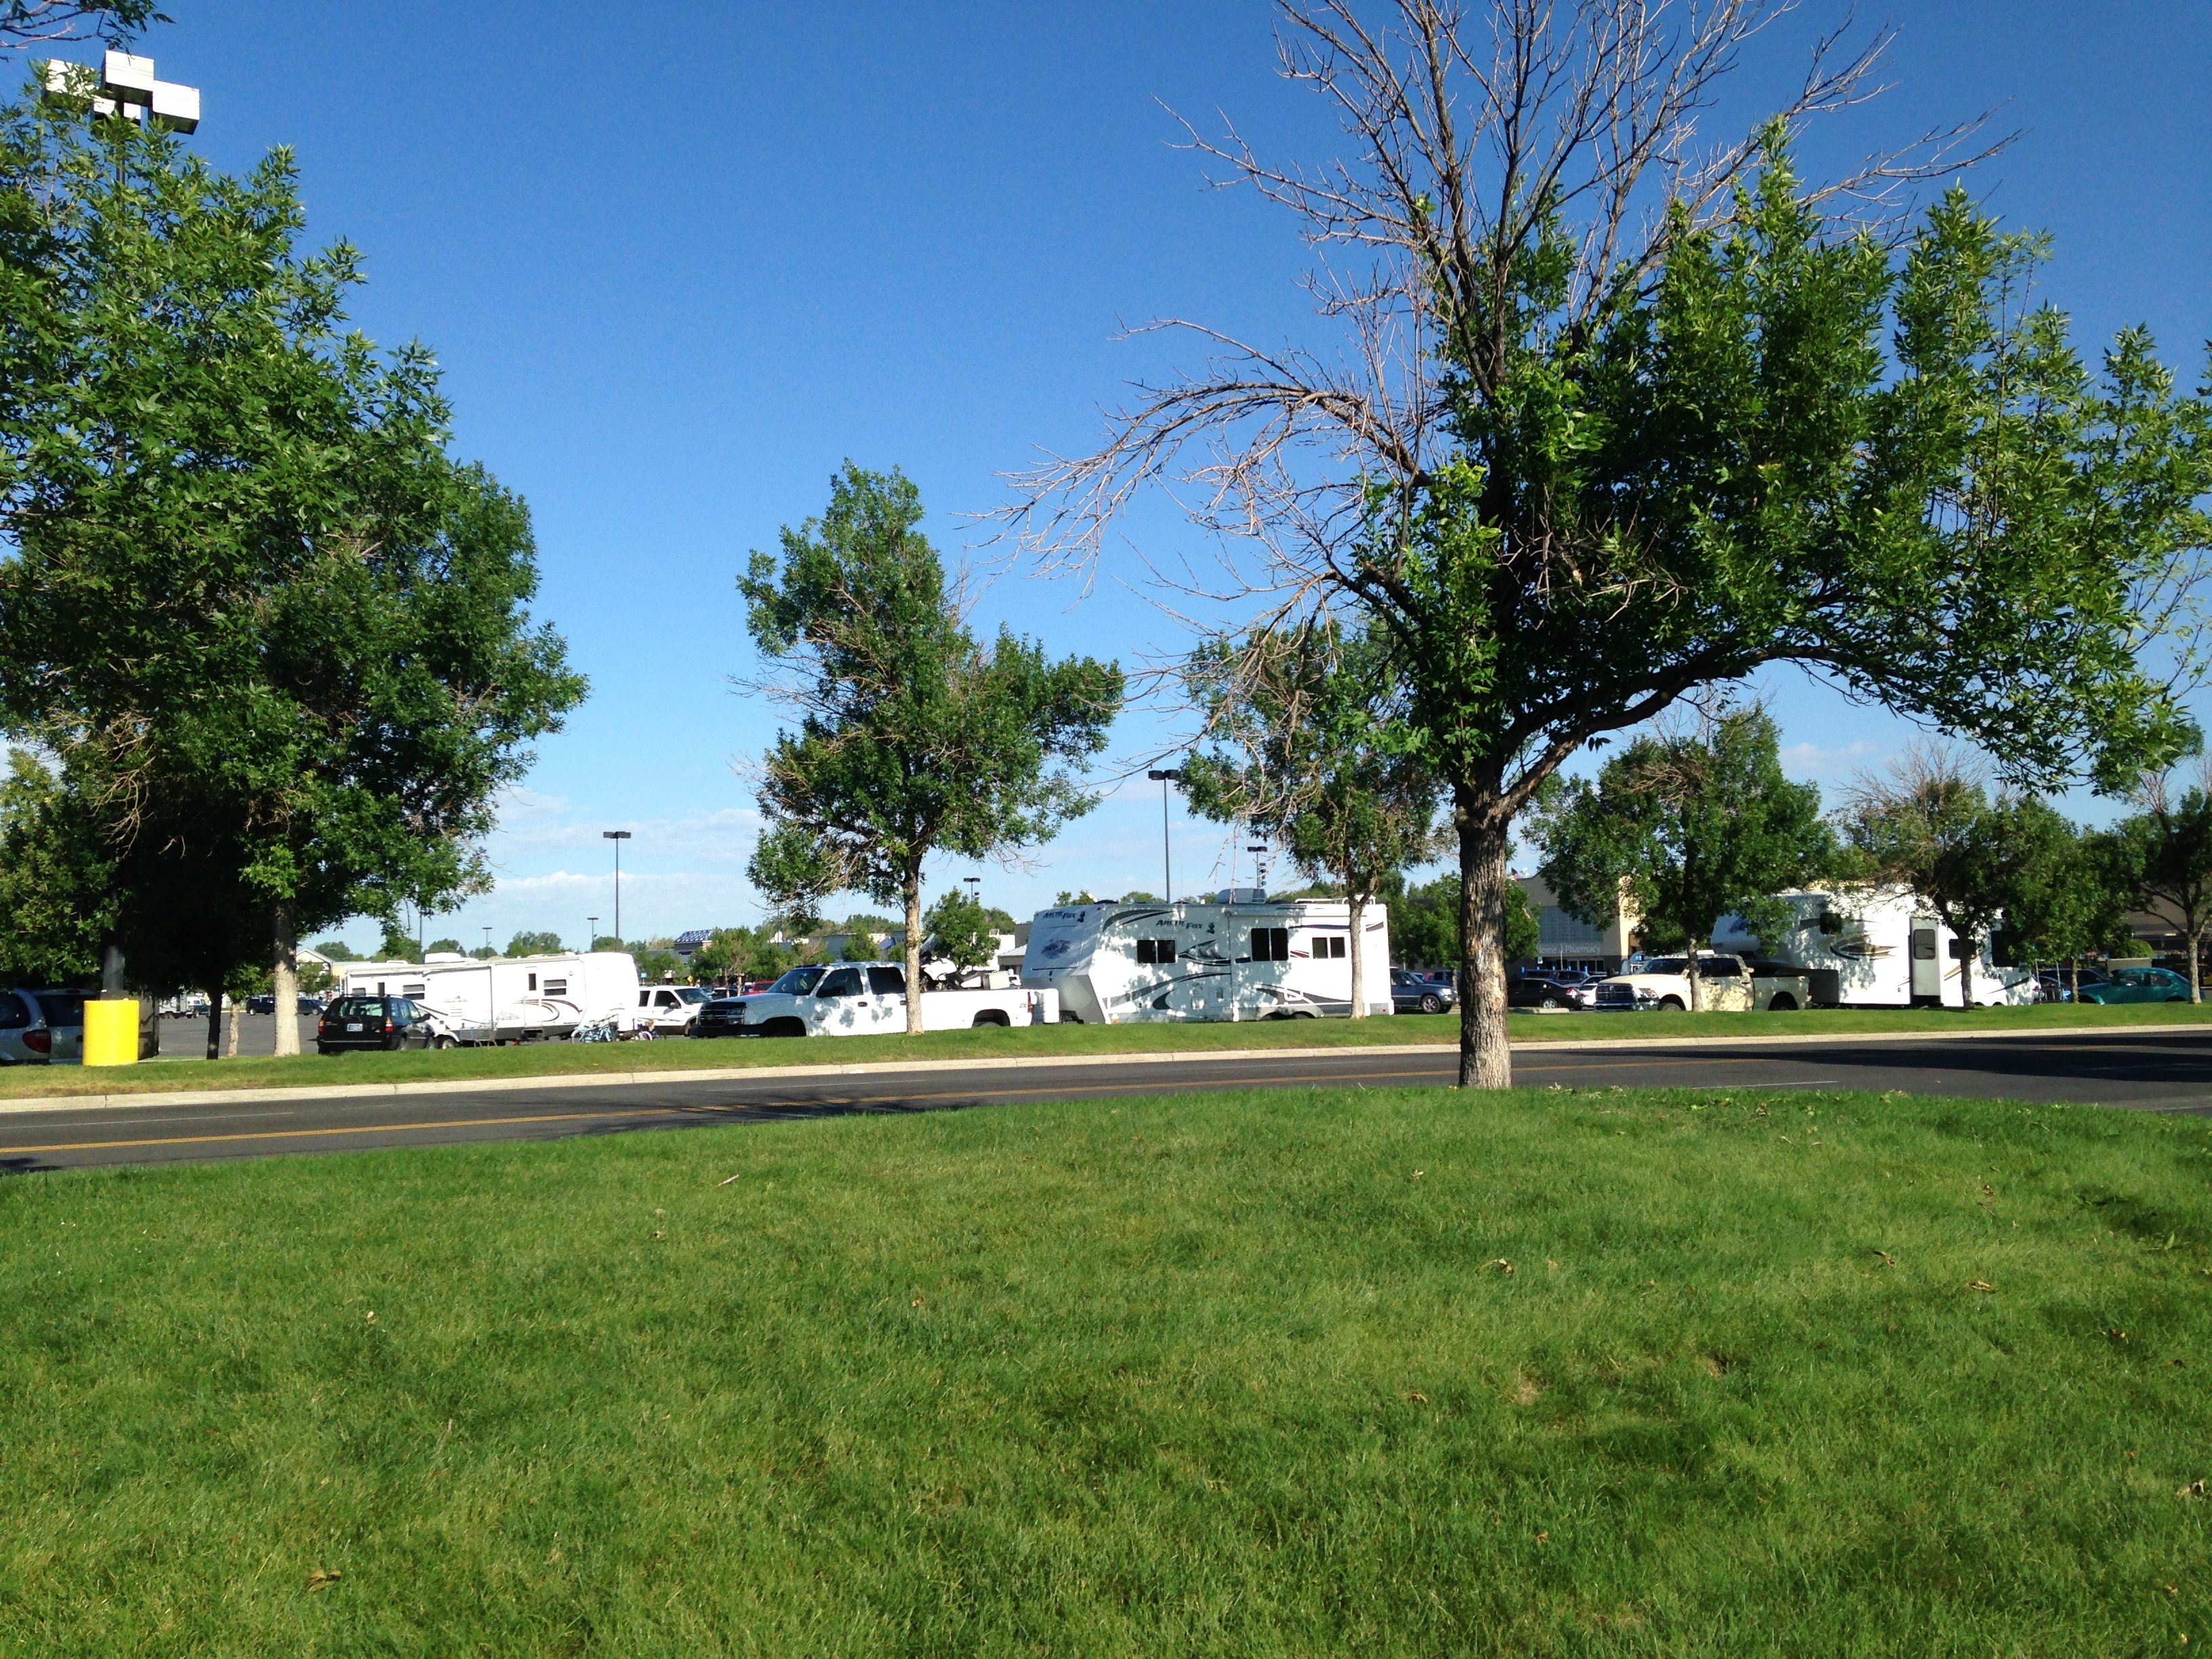 WalMart in Missoula, Montana